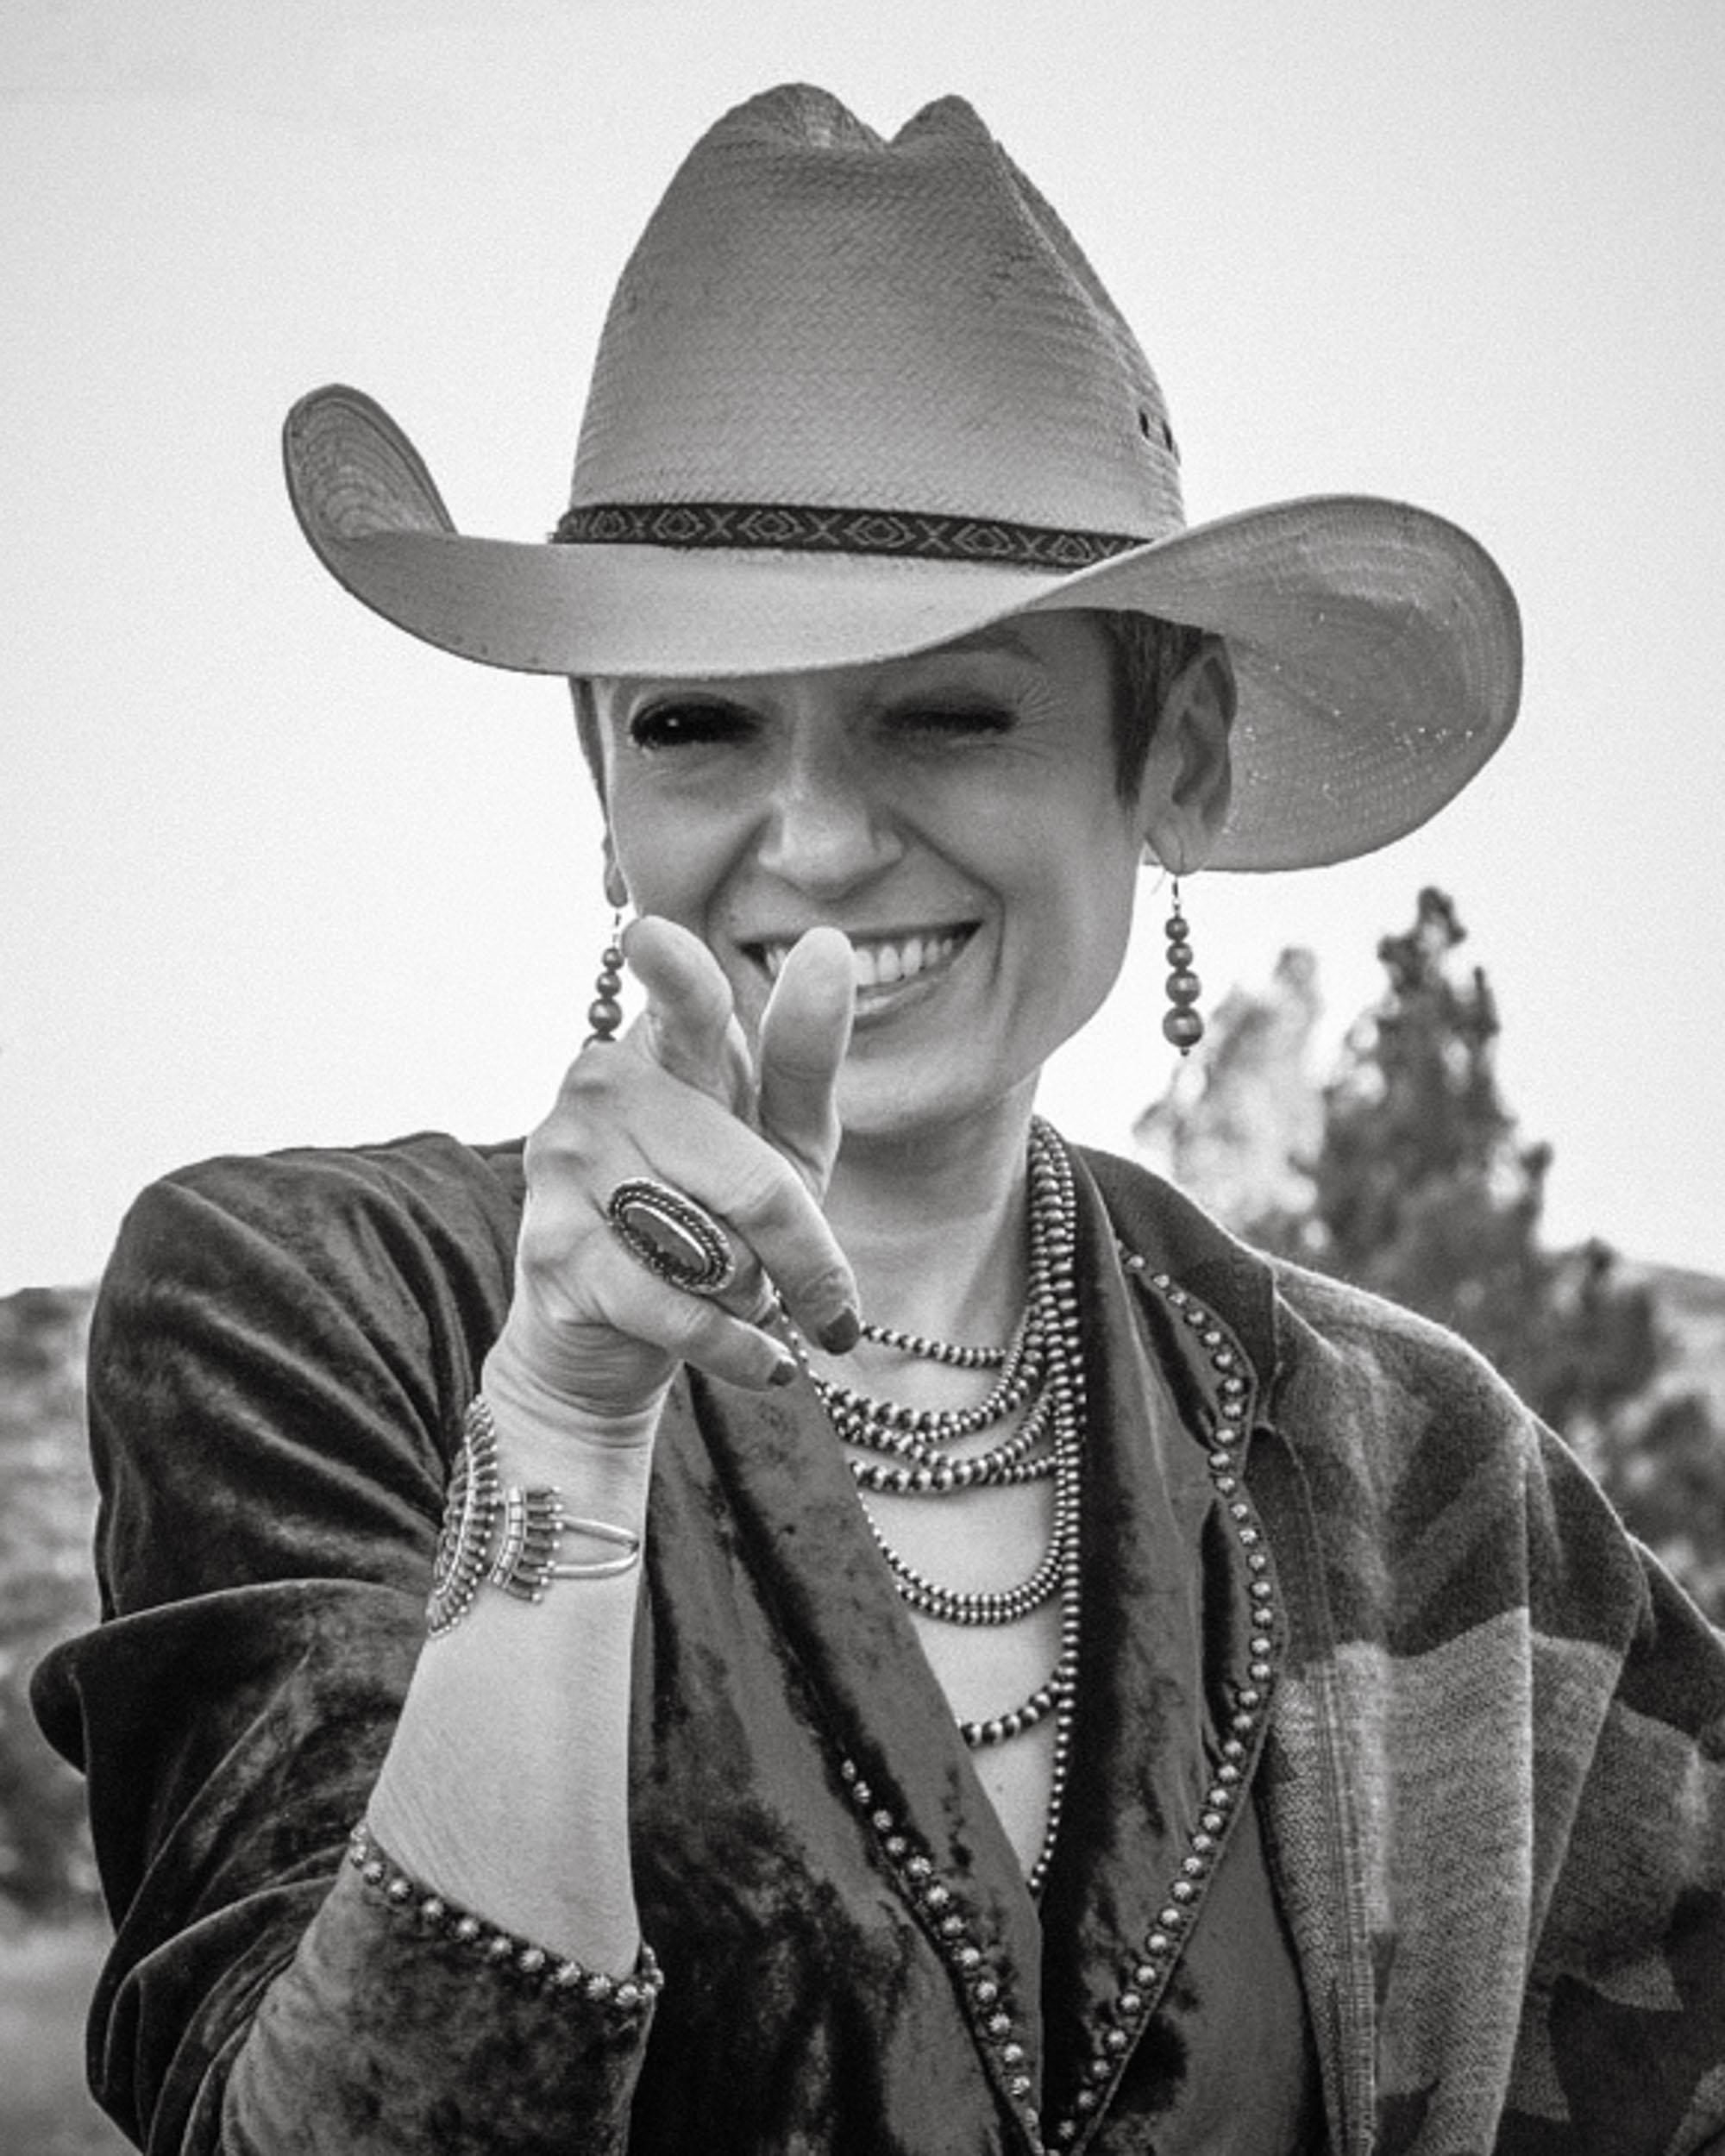 zainab-salbi-cowgirl-portrait-nm-usa-2017-11-26.jpg